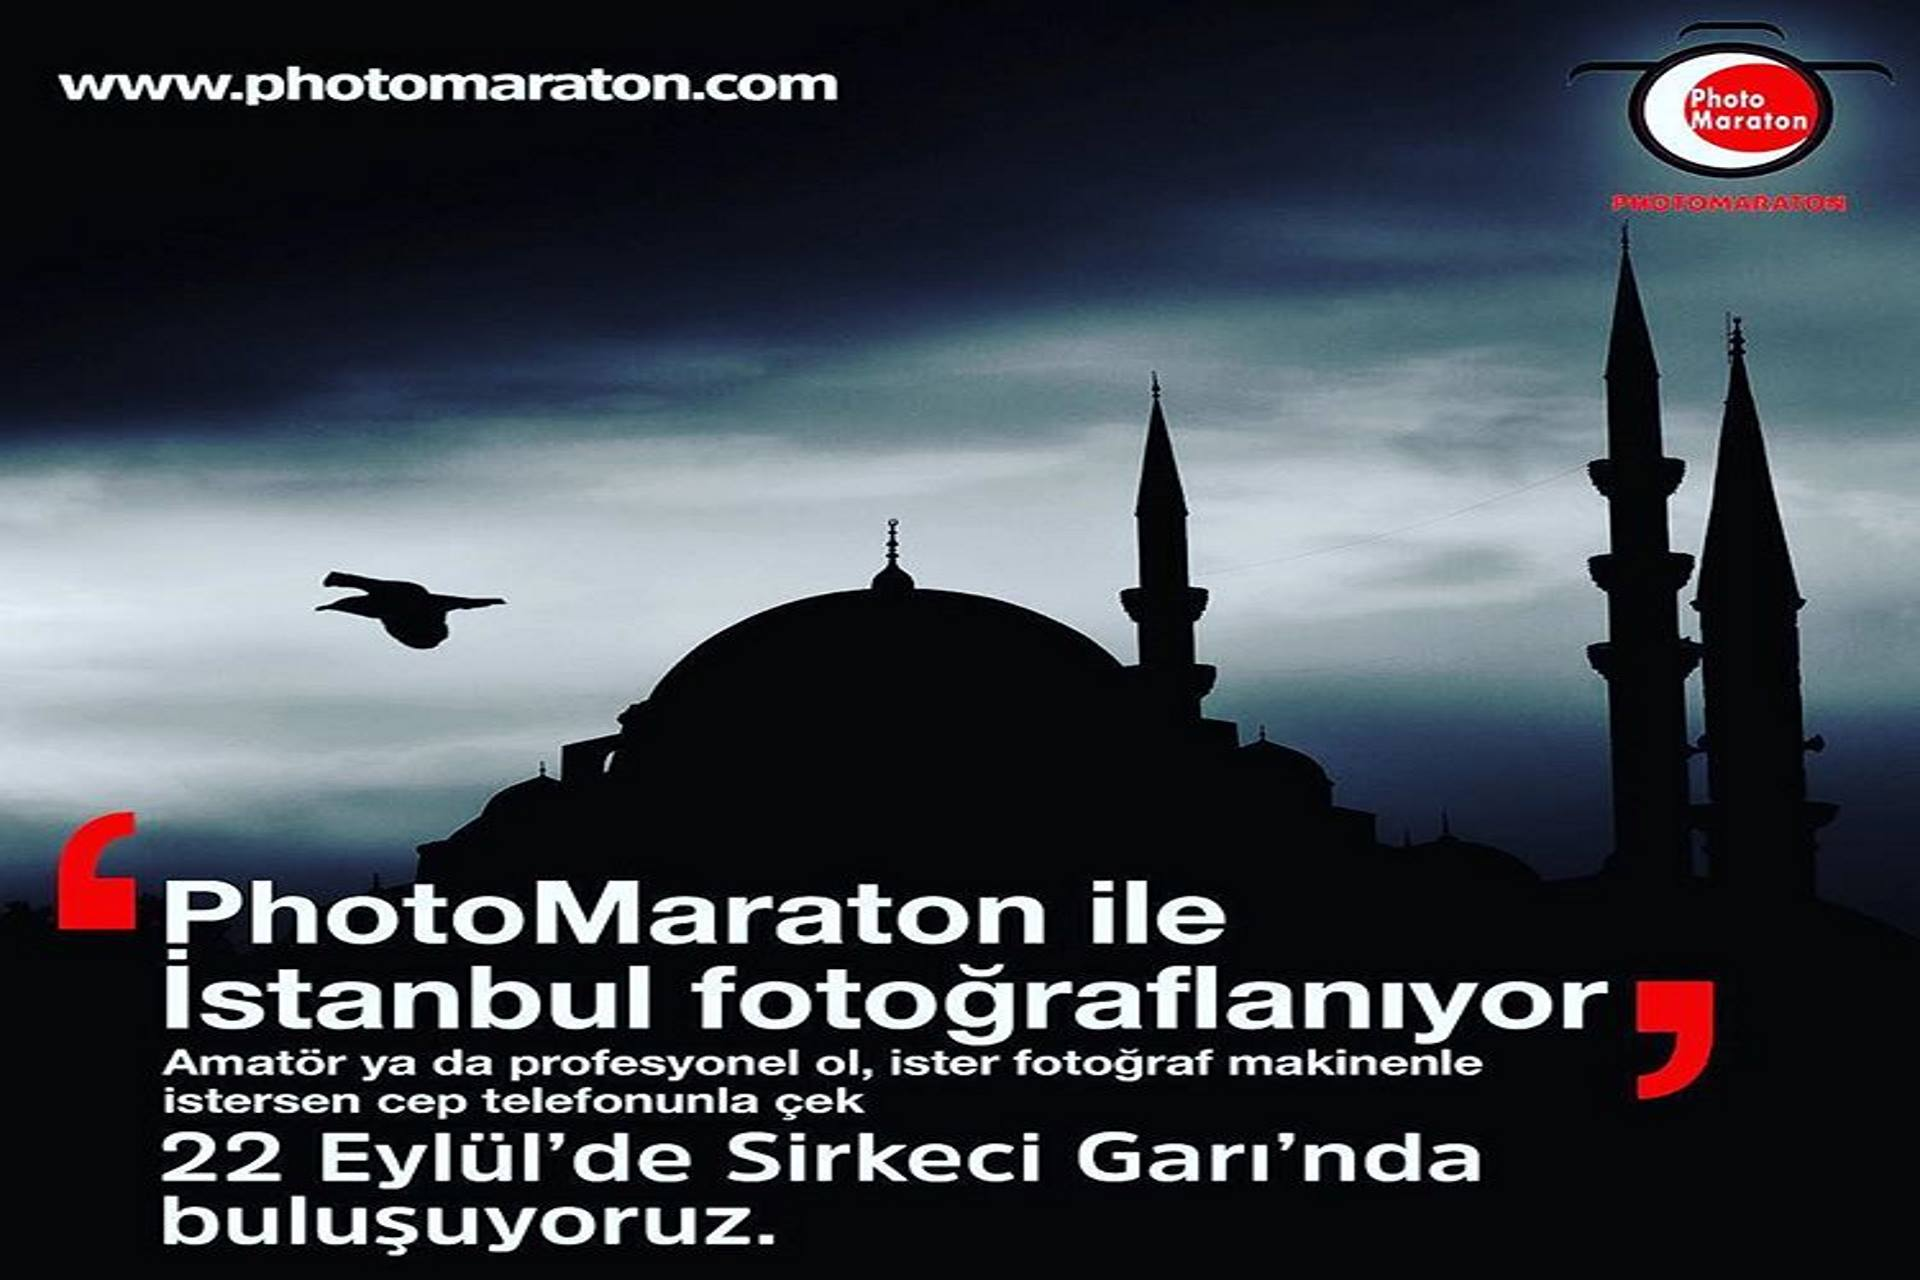 PhotoMaraton